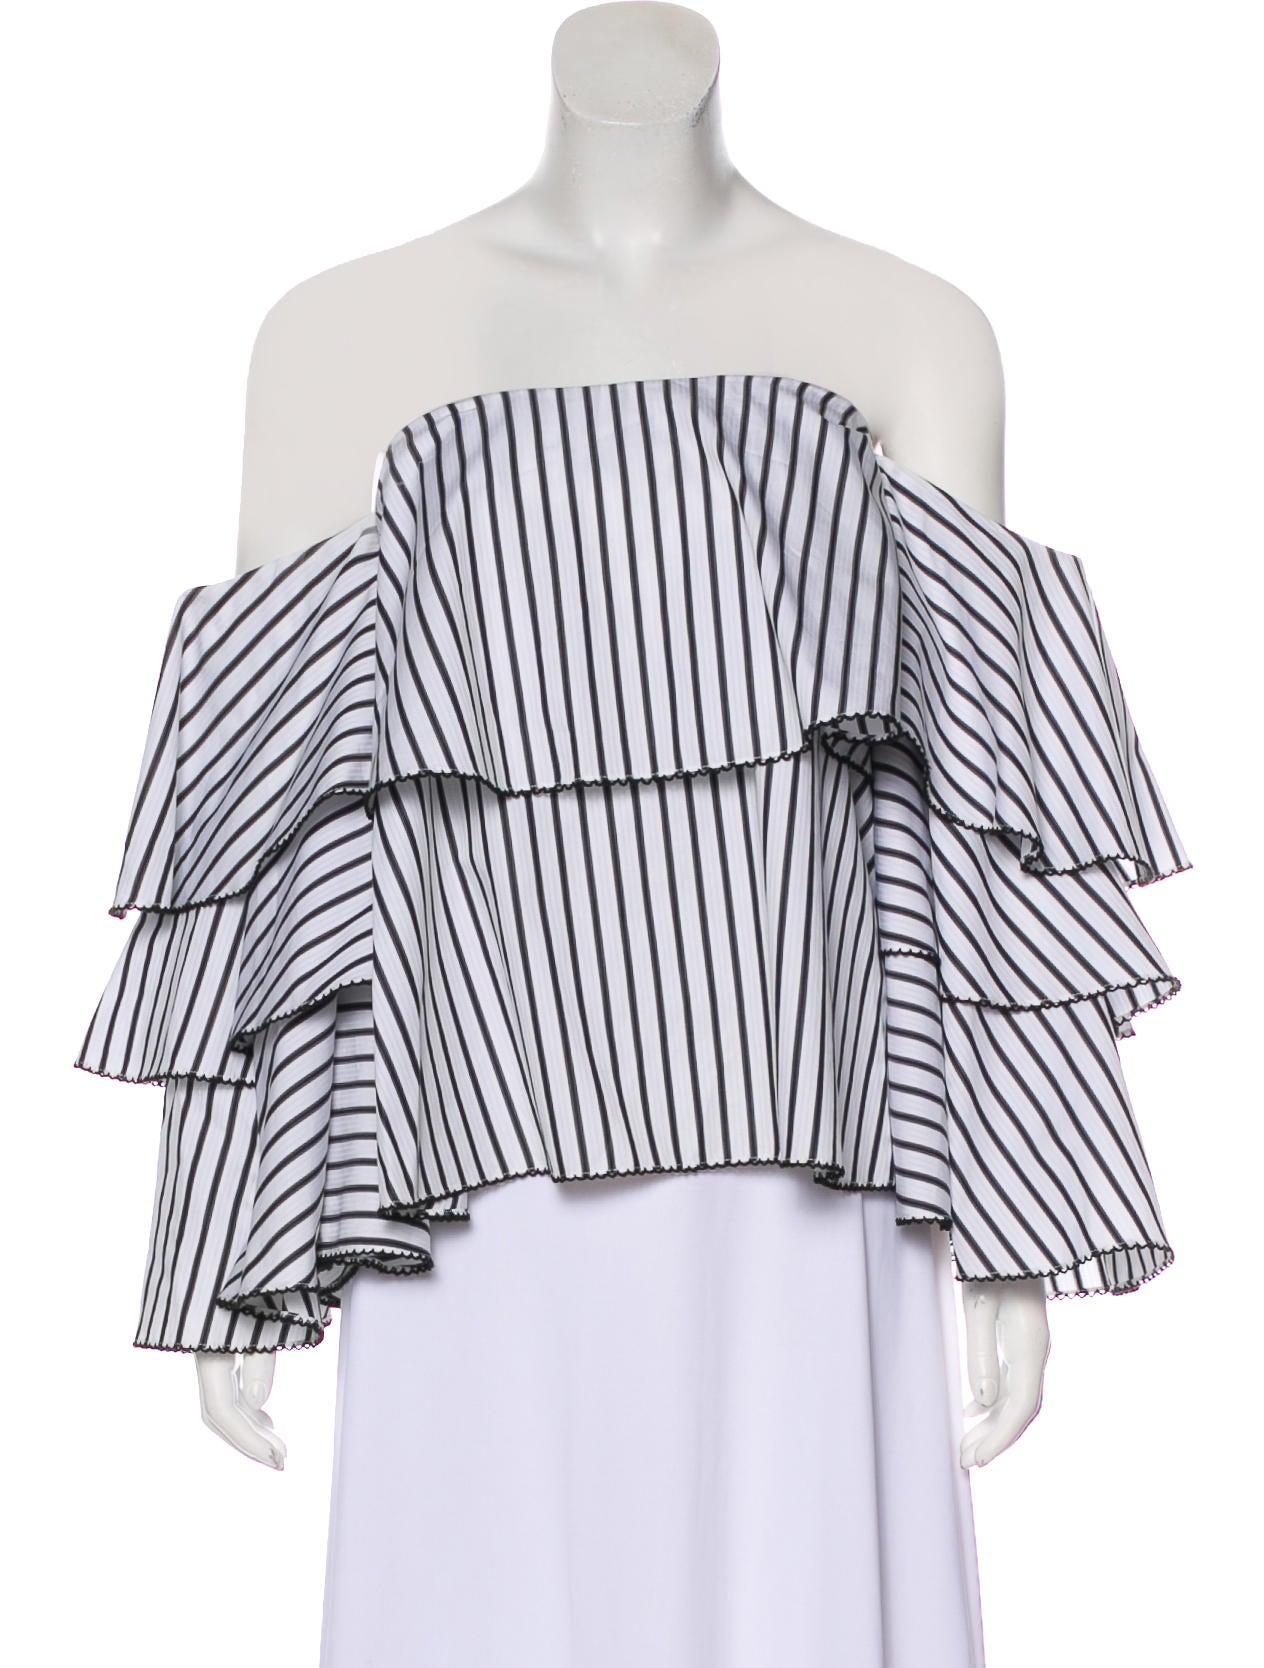 395b0007c26 Caroline Constas Striped Off-The-Shoulder Top - Clothing ...